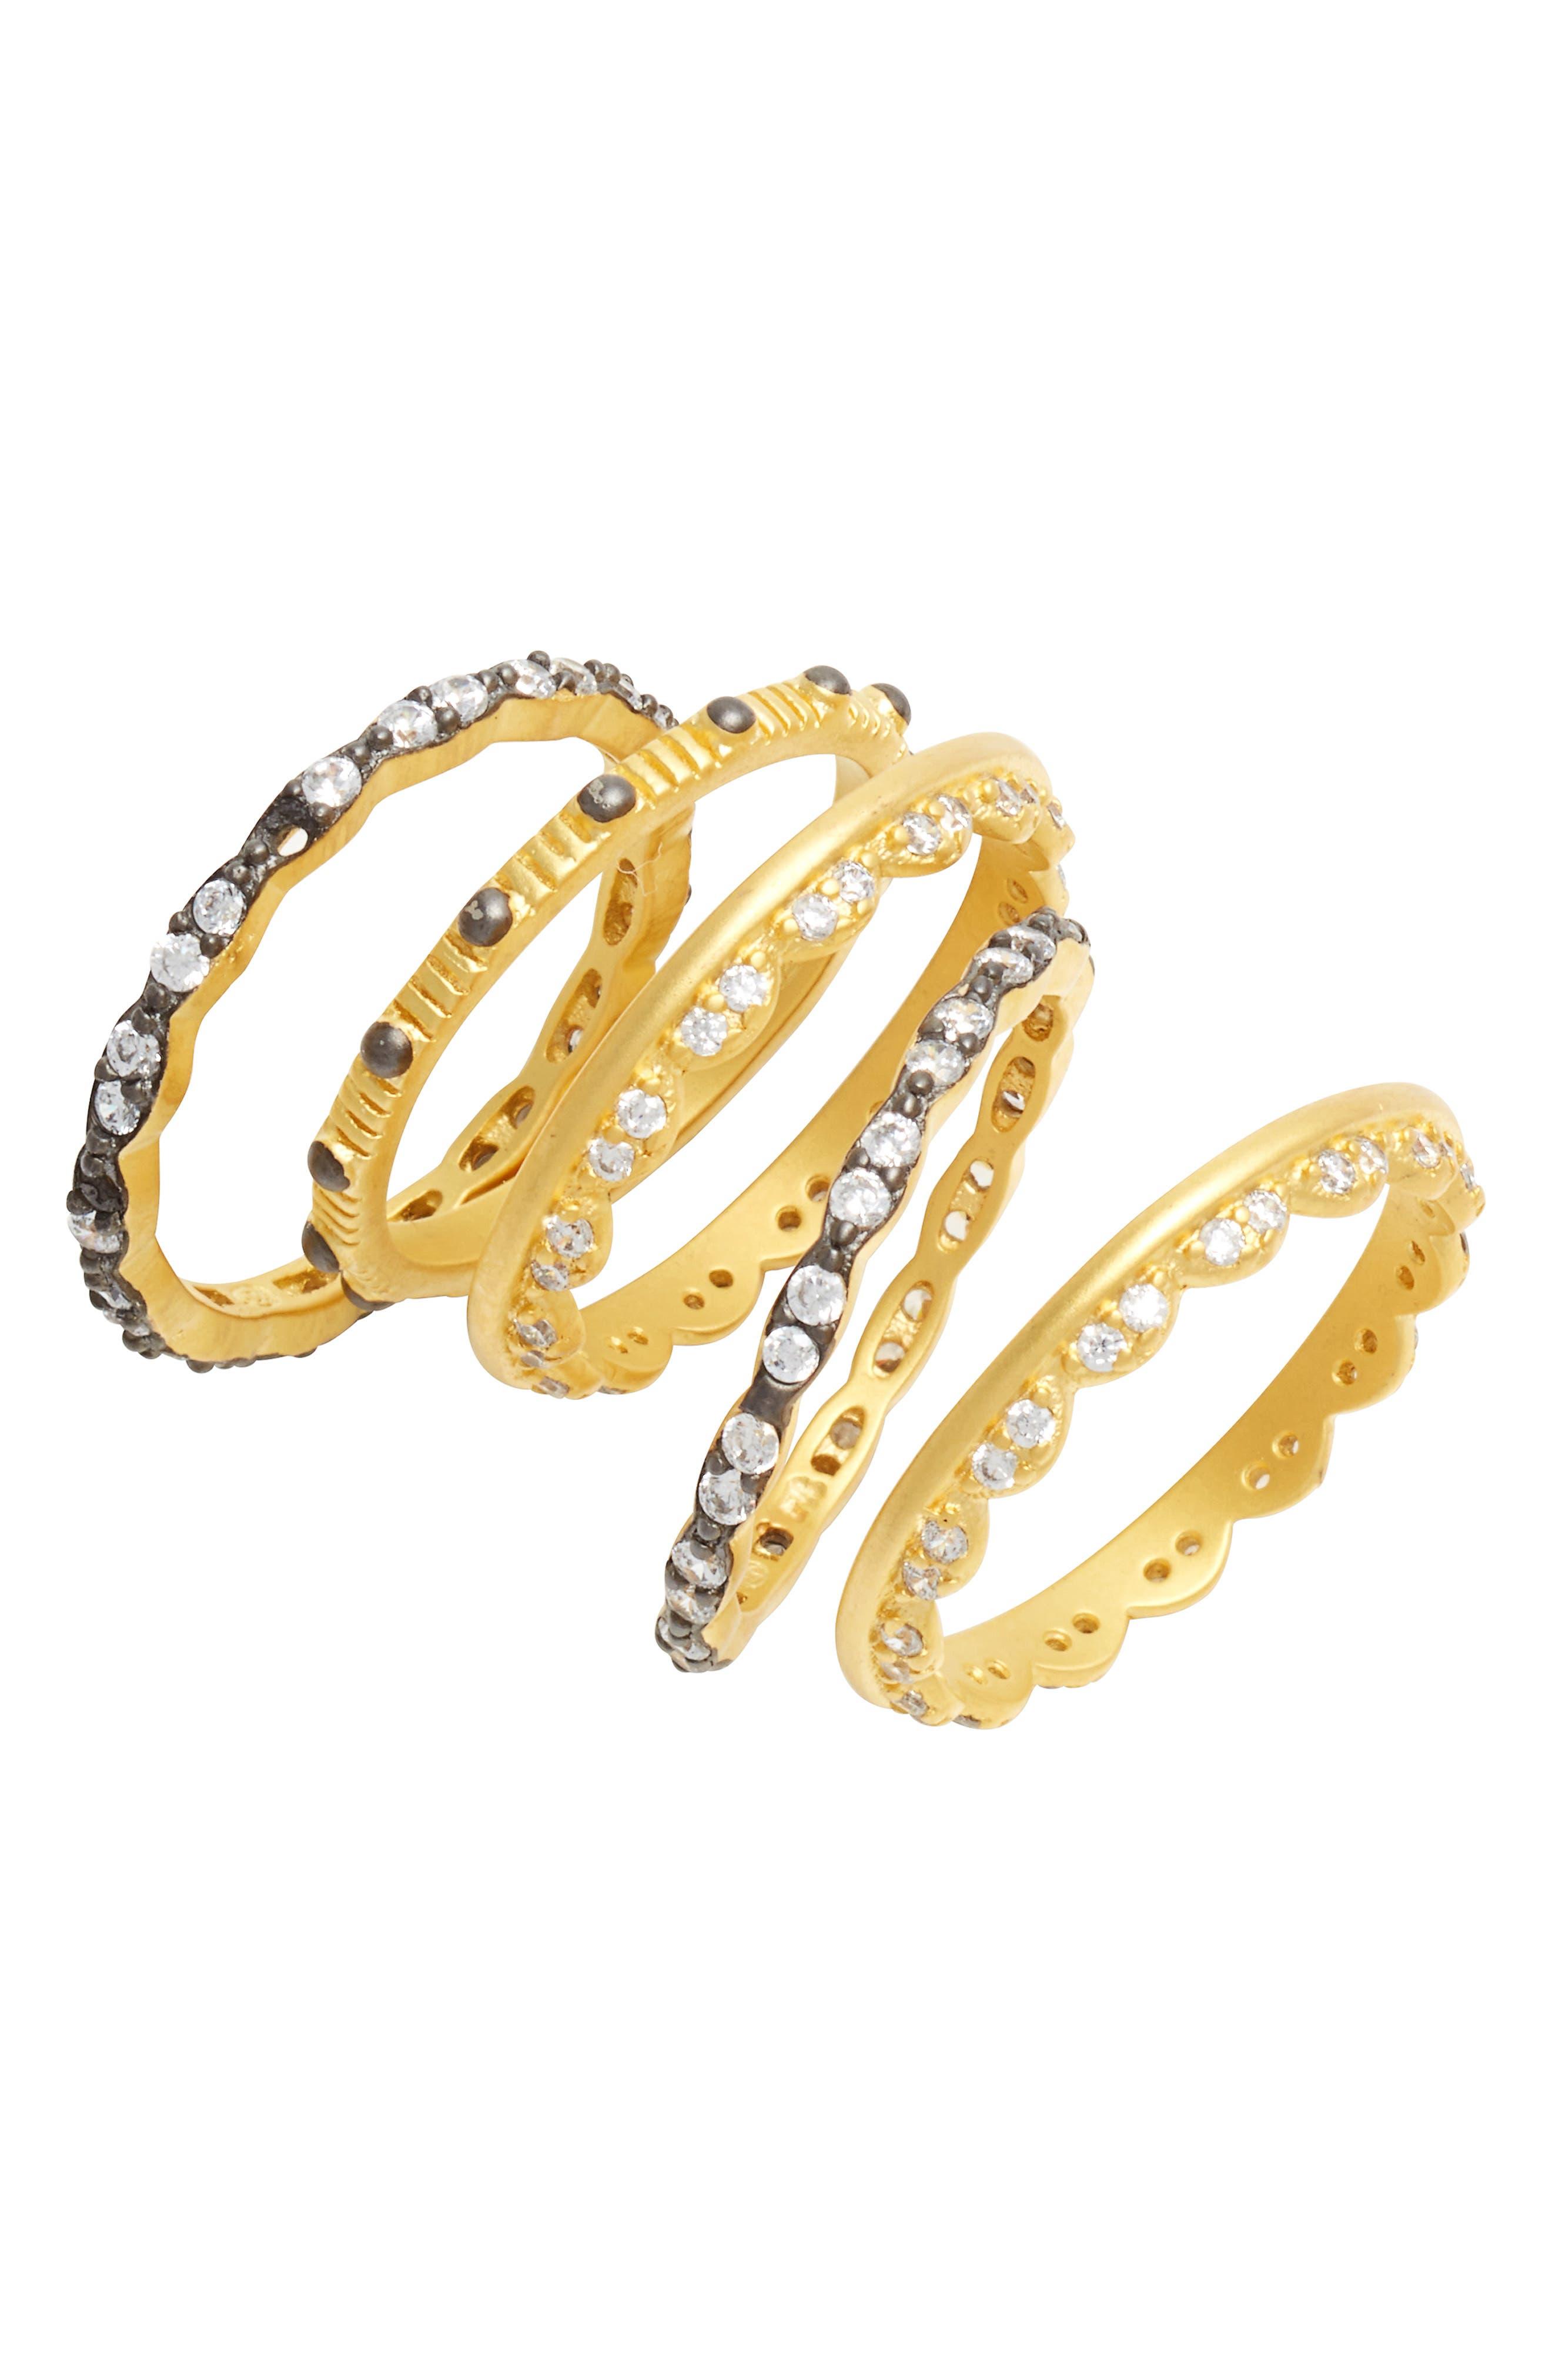 Set of 5 Stack Rings,                         Main,                         color, Gold/ Black Rhodium